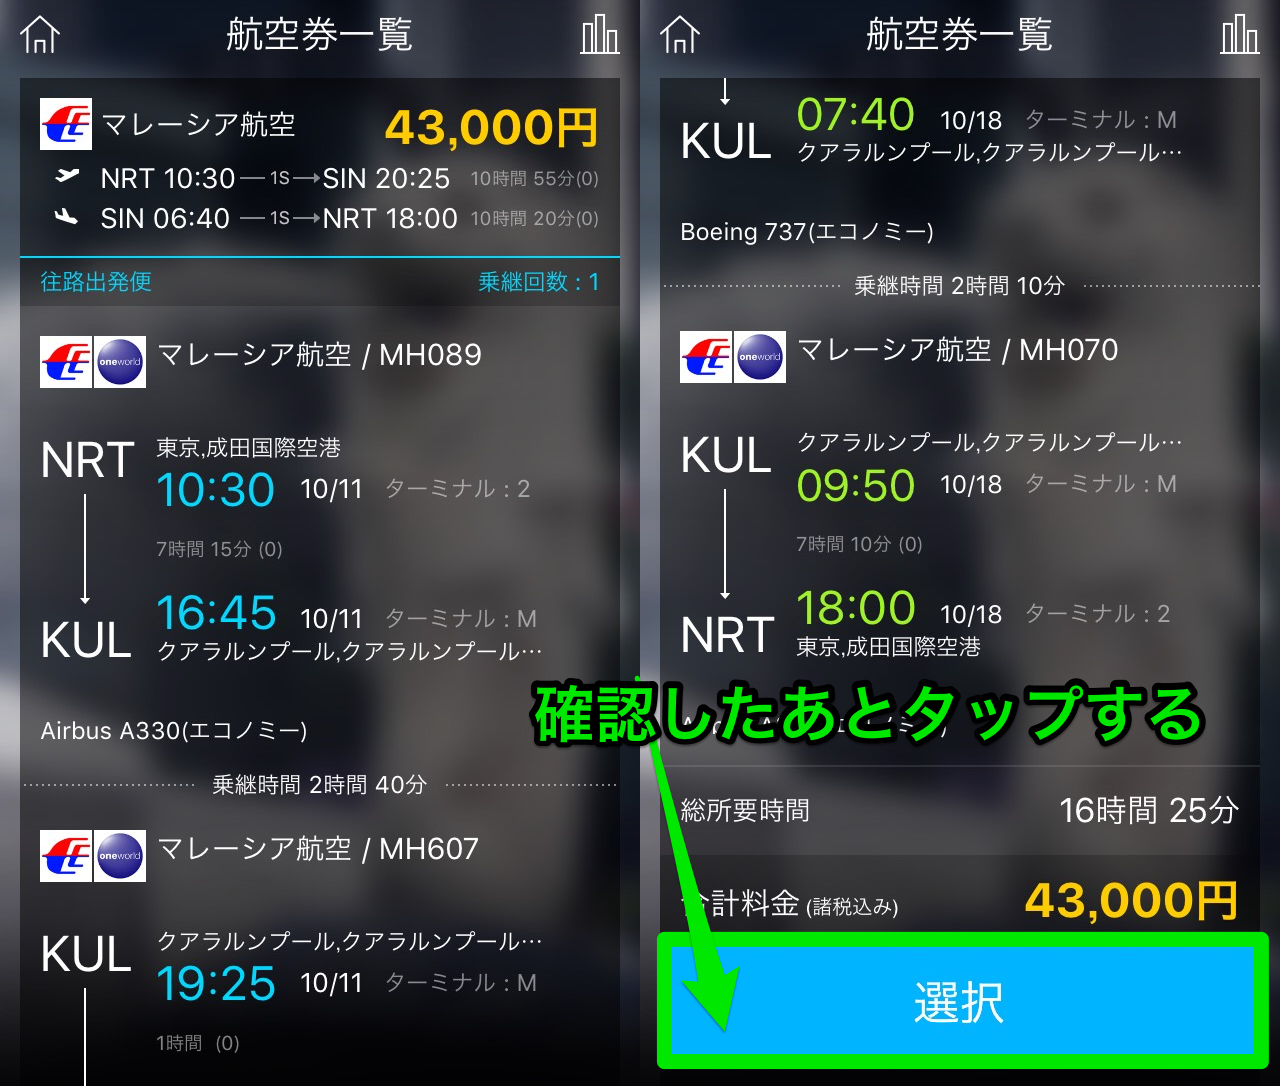 H.I.S.アプリ「航空券・ホテル」の航空券検索でフライトを決定